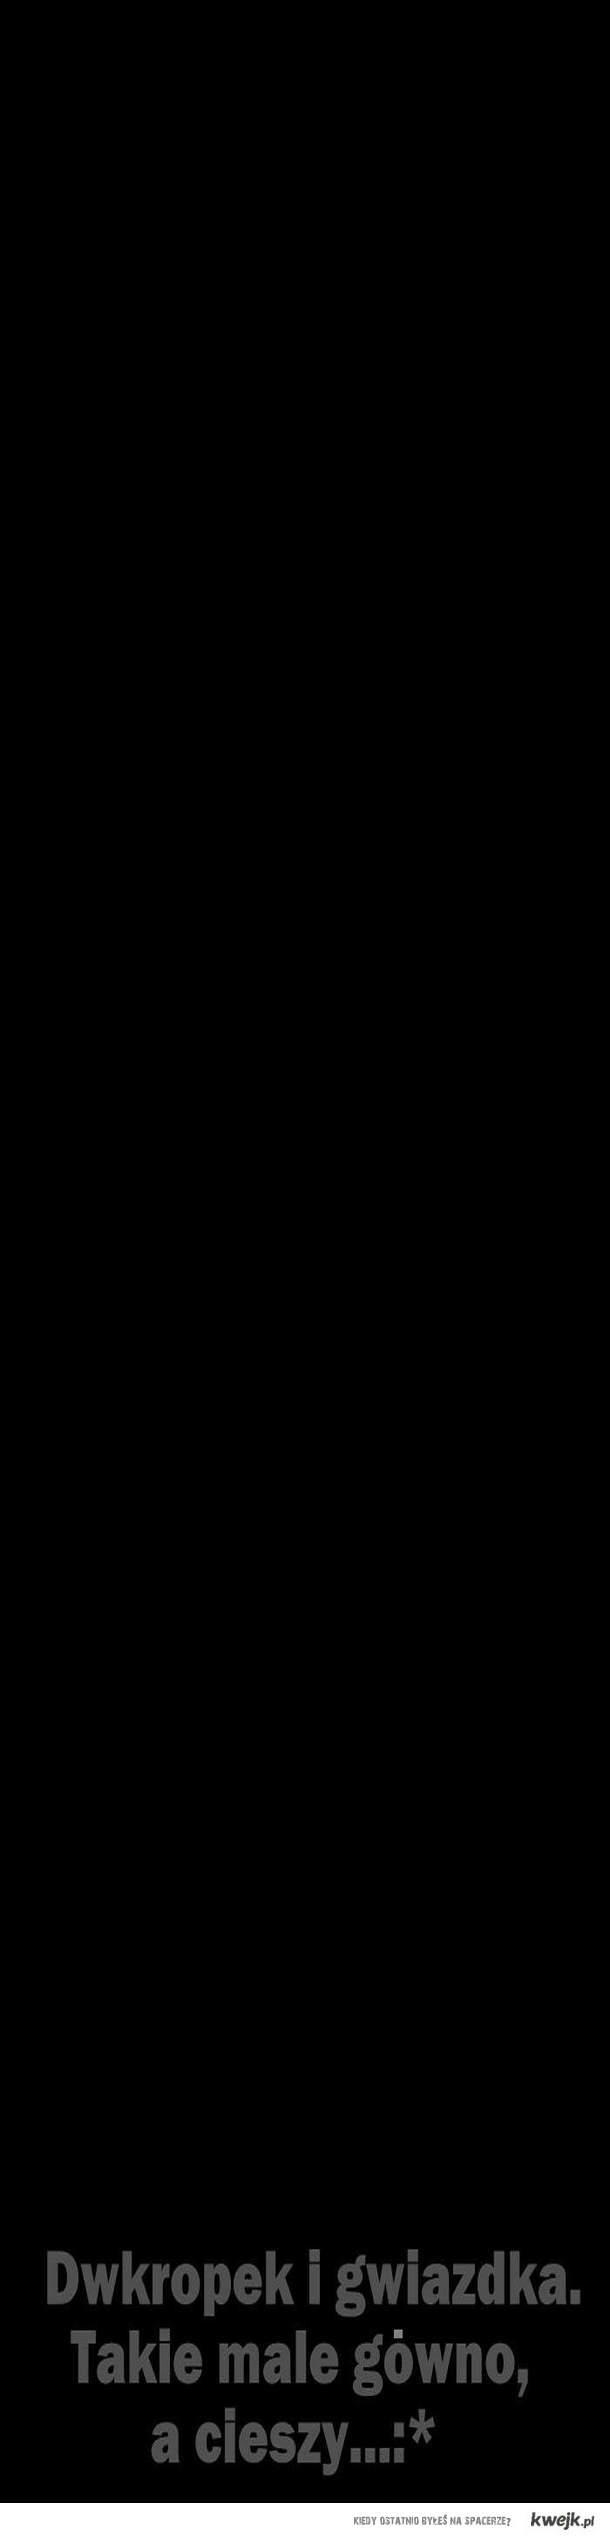 dwukropek i gwiazdka